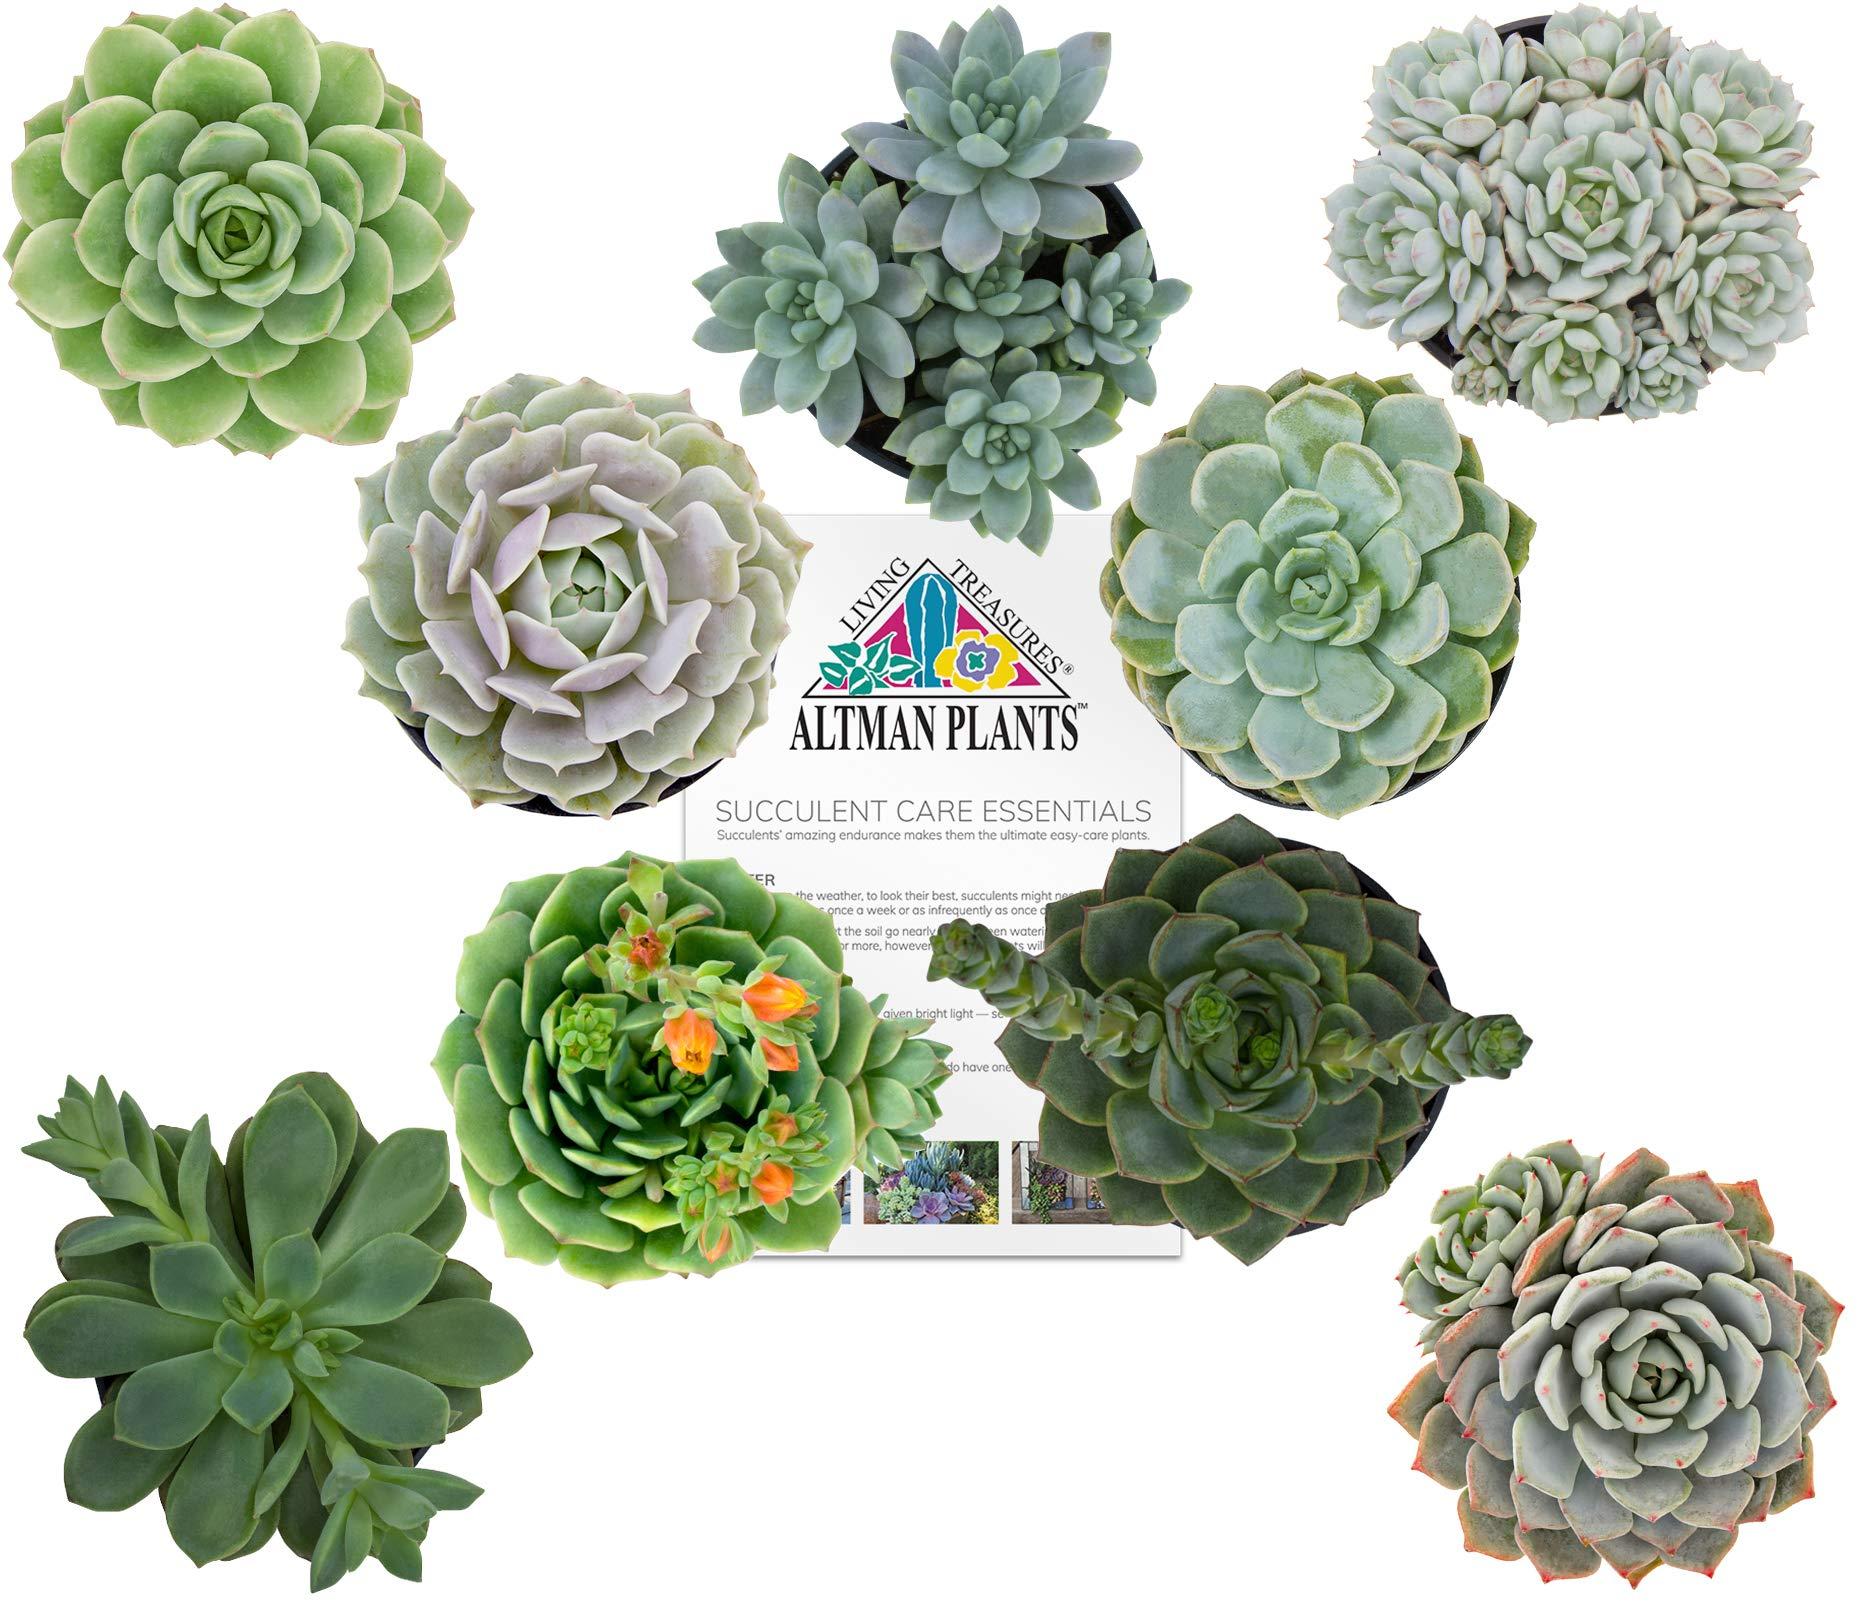 Altman Plants Assorted Live Succulents Flowering Rosette Collection Echeveria, sedeveria, perfect for party favors and arrangements, 3.5'', 9 Pack